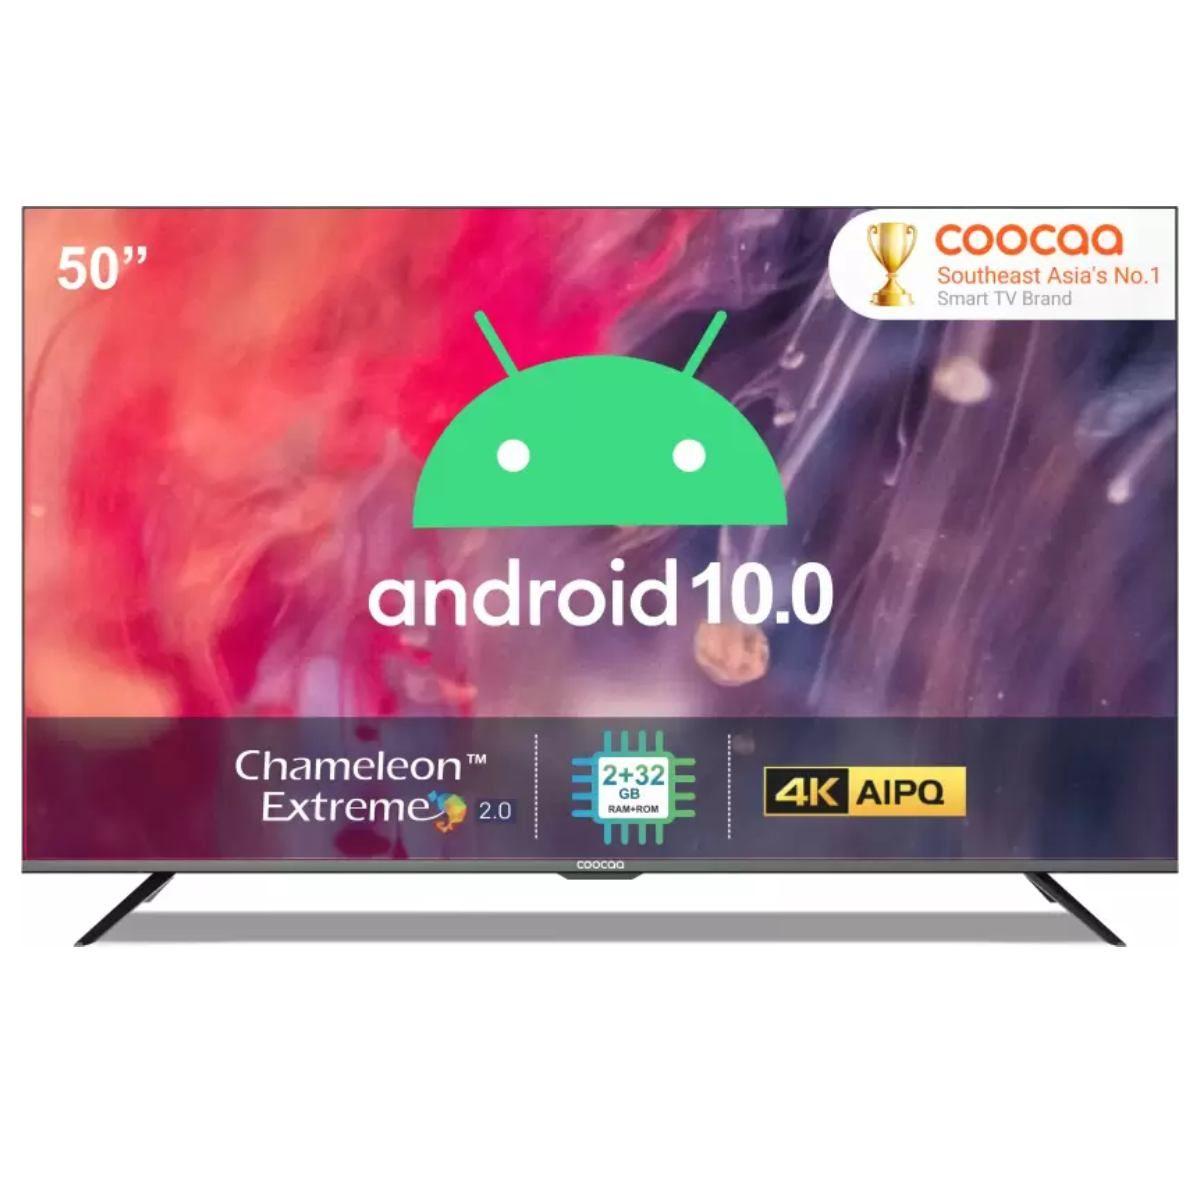 Coocaa 50 அங்குலம் 4K LED Smart டிவி with 10.0 கேள்வி  (50S6G Pro)